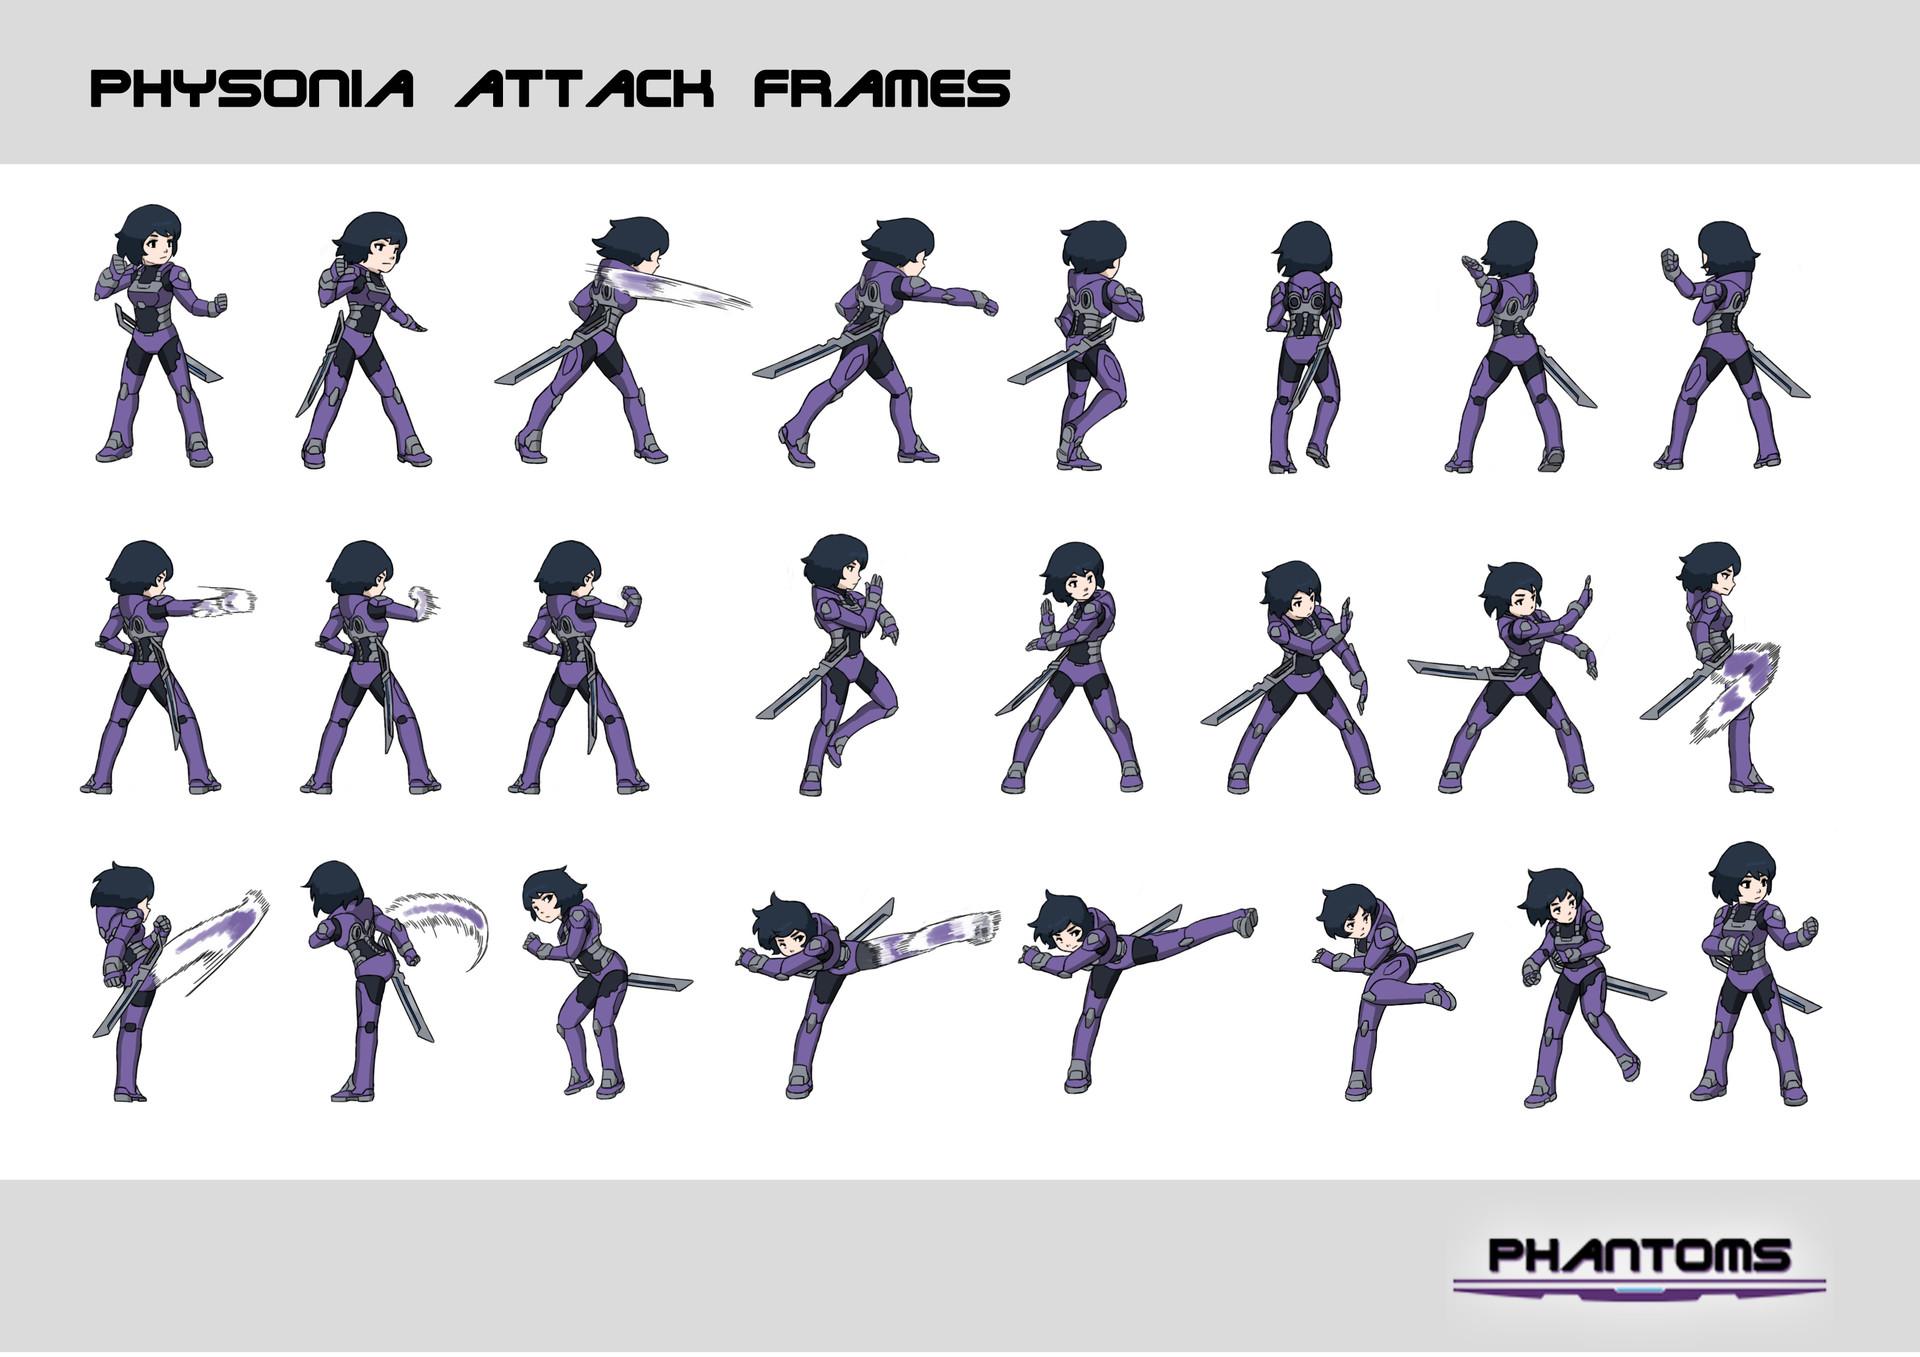 Jun Yi - Physonia Attack Frame